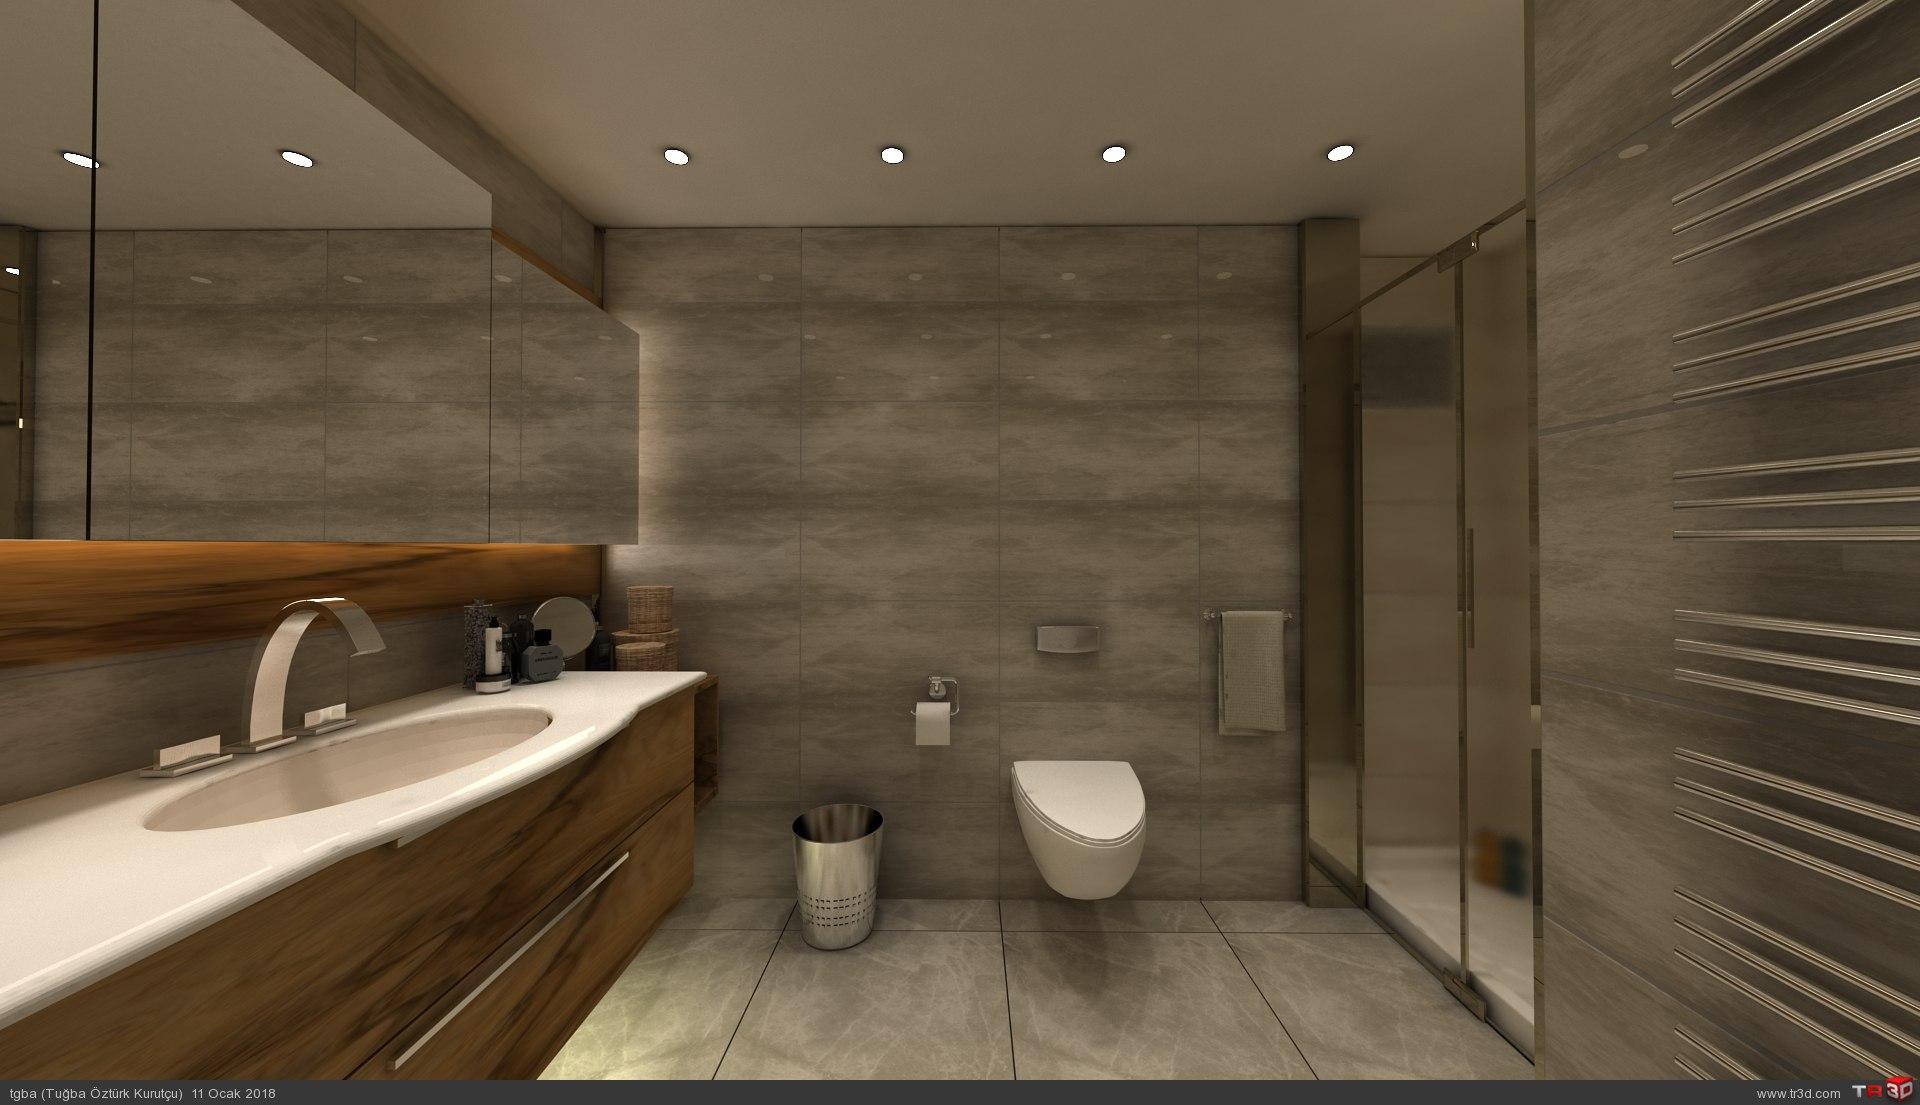 Banyo/bathroom Sade 1